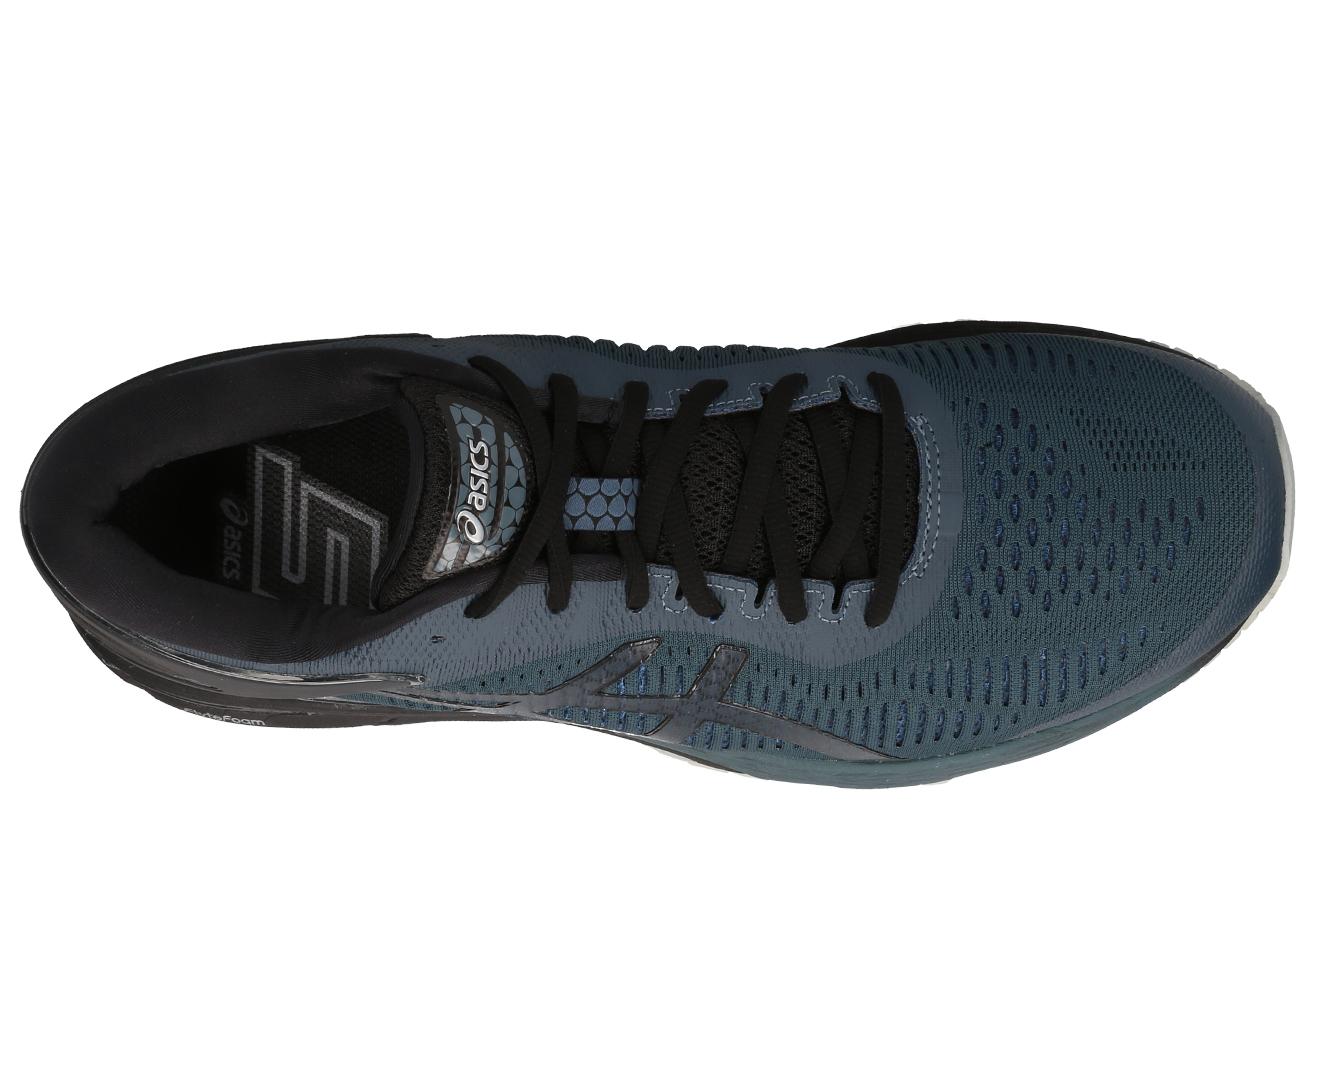 d65cc0932e ASICS Men's GEL-Kayano 25 Shoe - Ironclad/Black